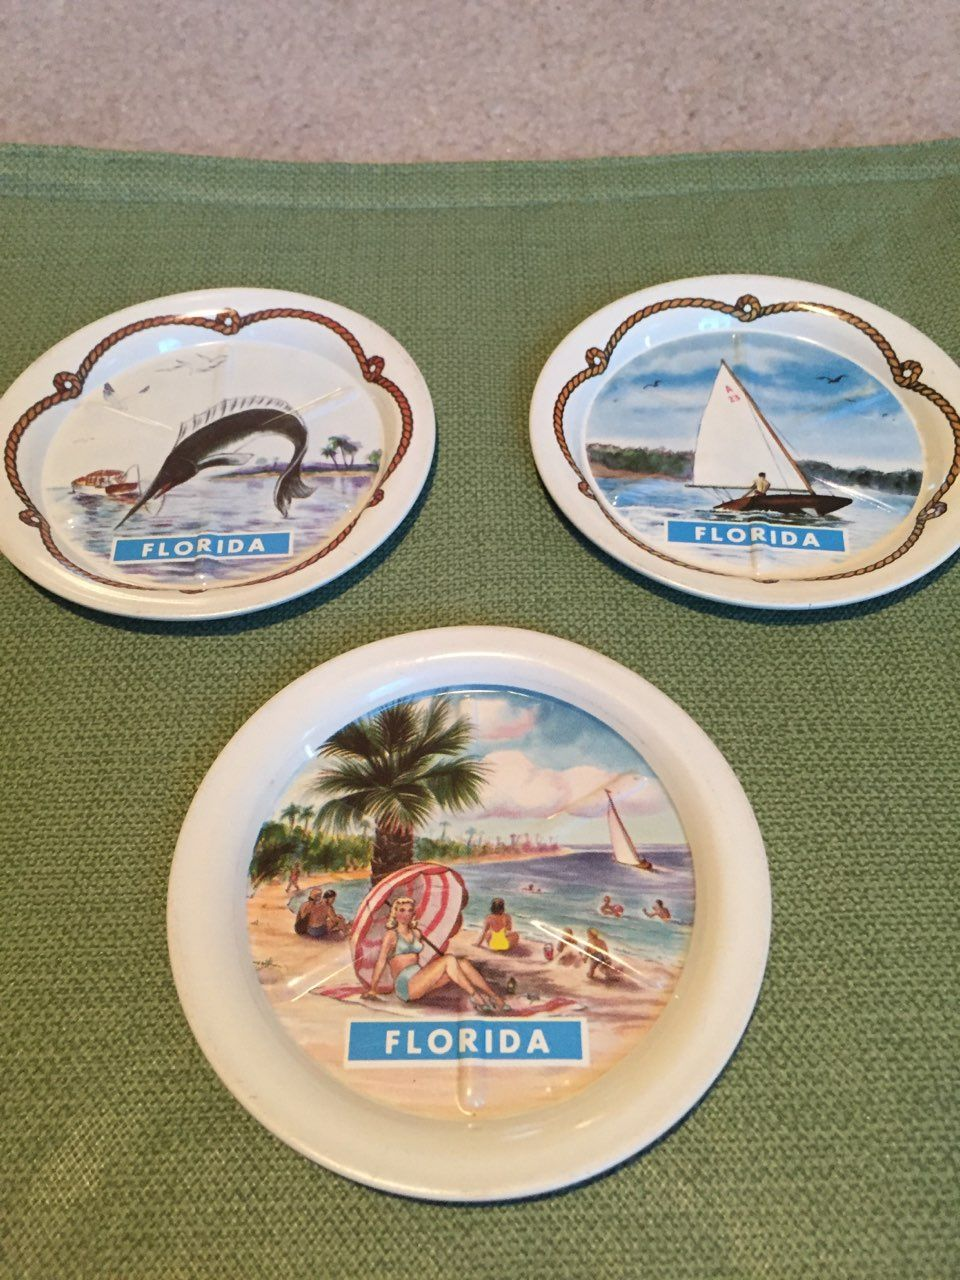 VINTAGE 1950S FLORIDA THEMED DRINK COASTERS